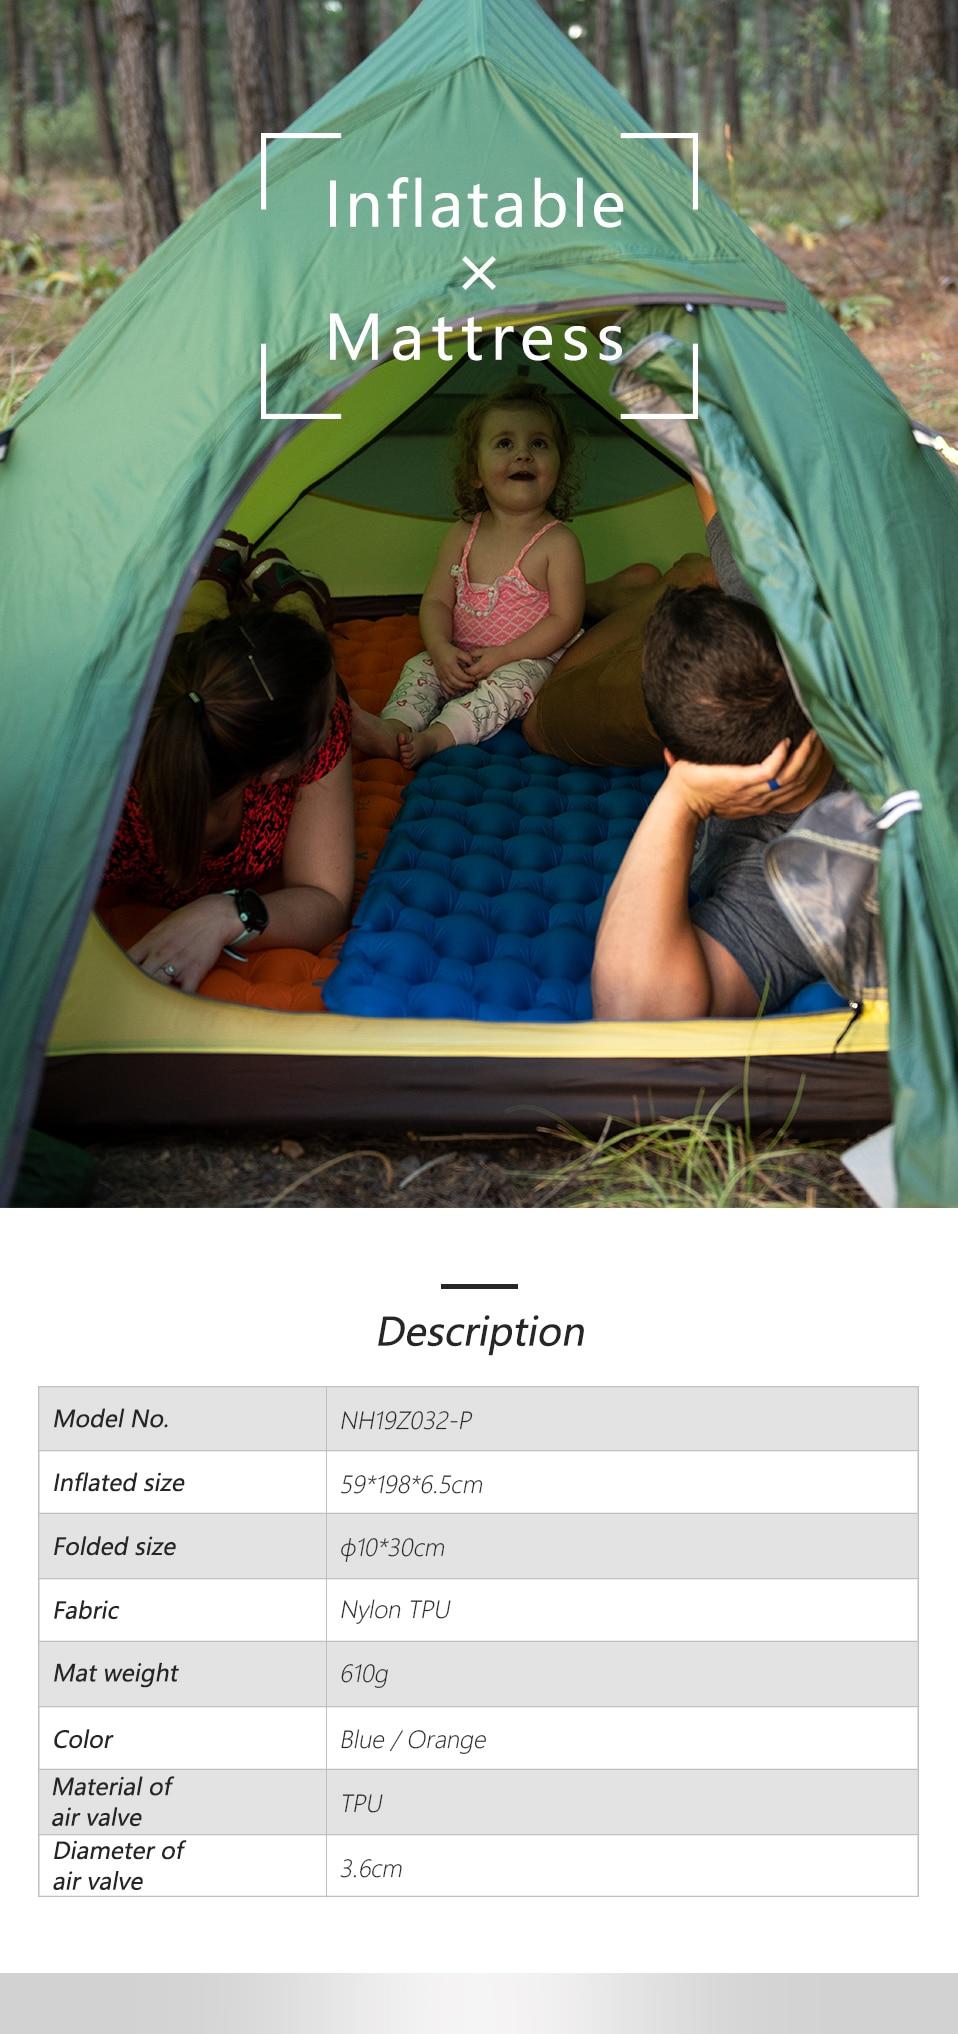 Naturehike náilon tpu acampamento esteira almofada de